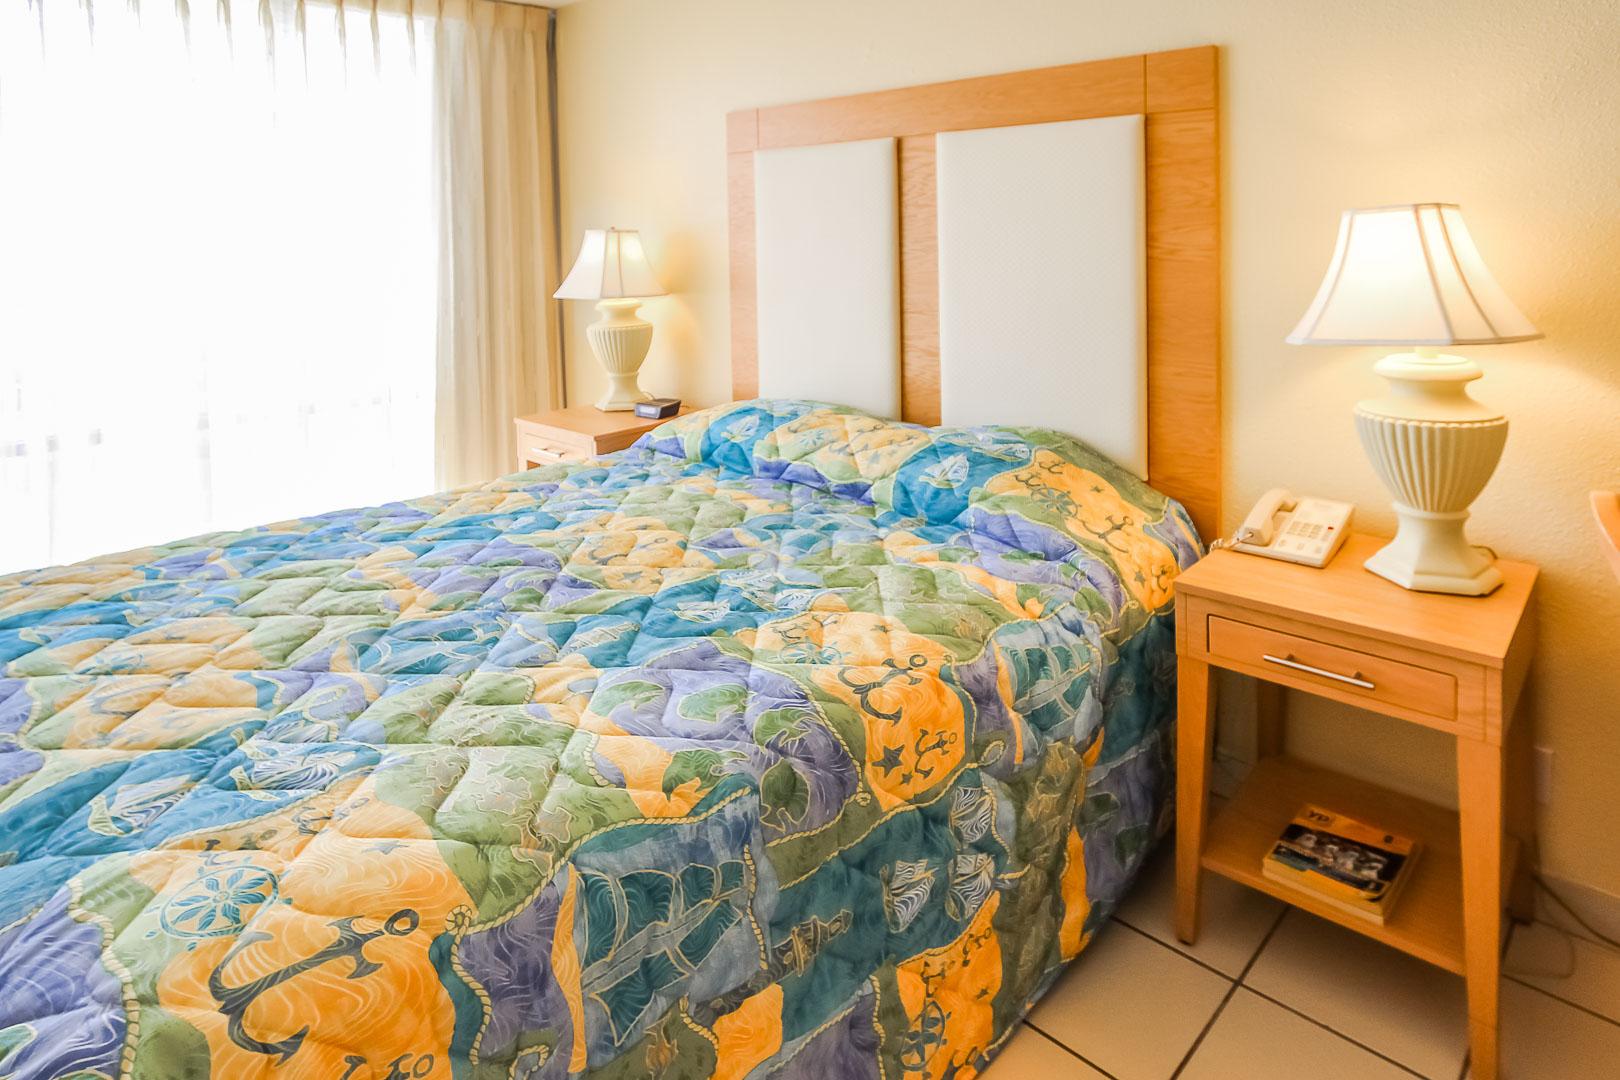 A charming bedroom at VRI's Royale Beach Tennis Club in Texas.